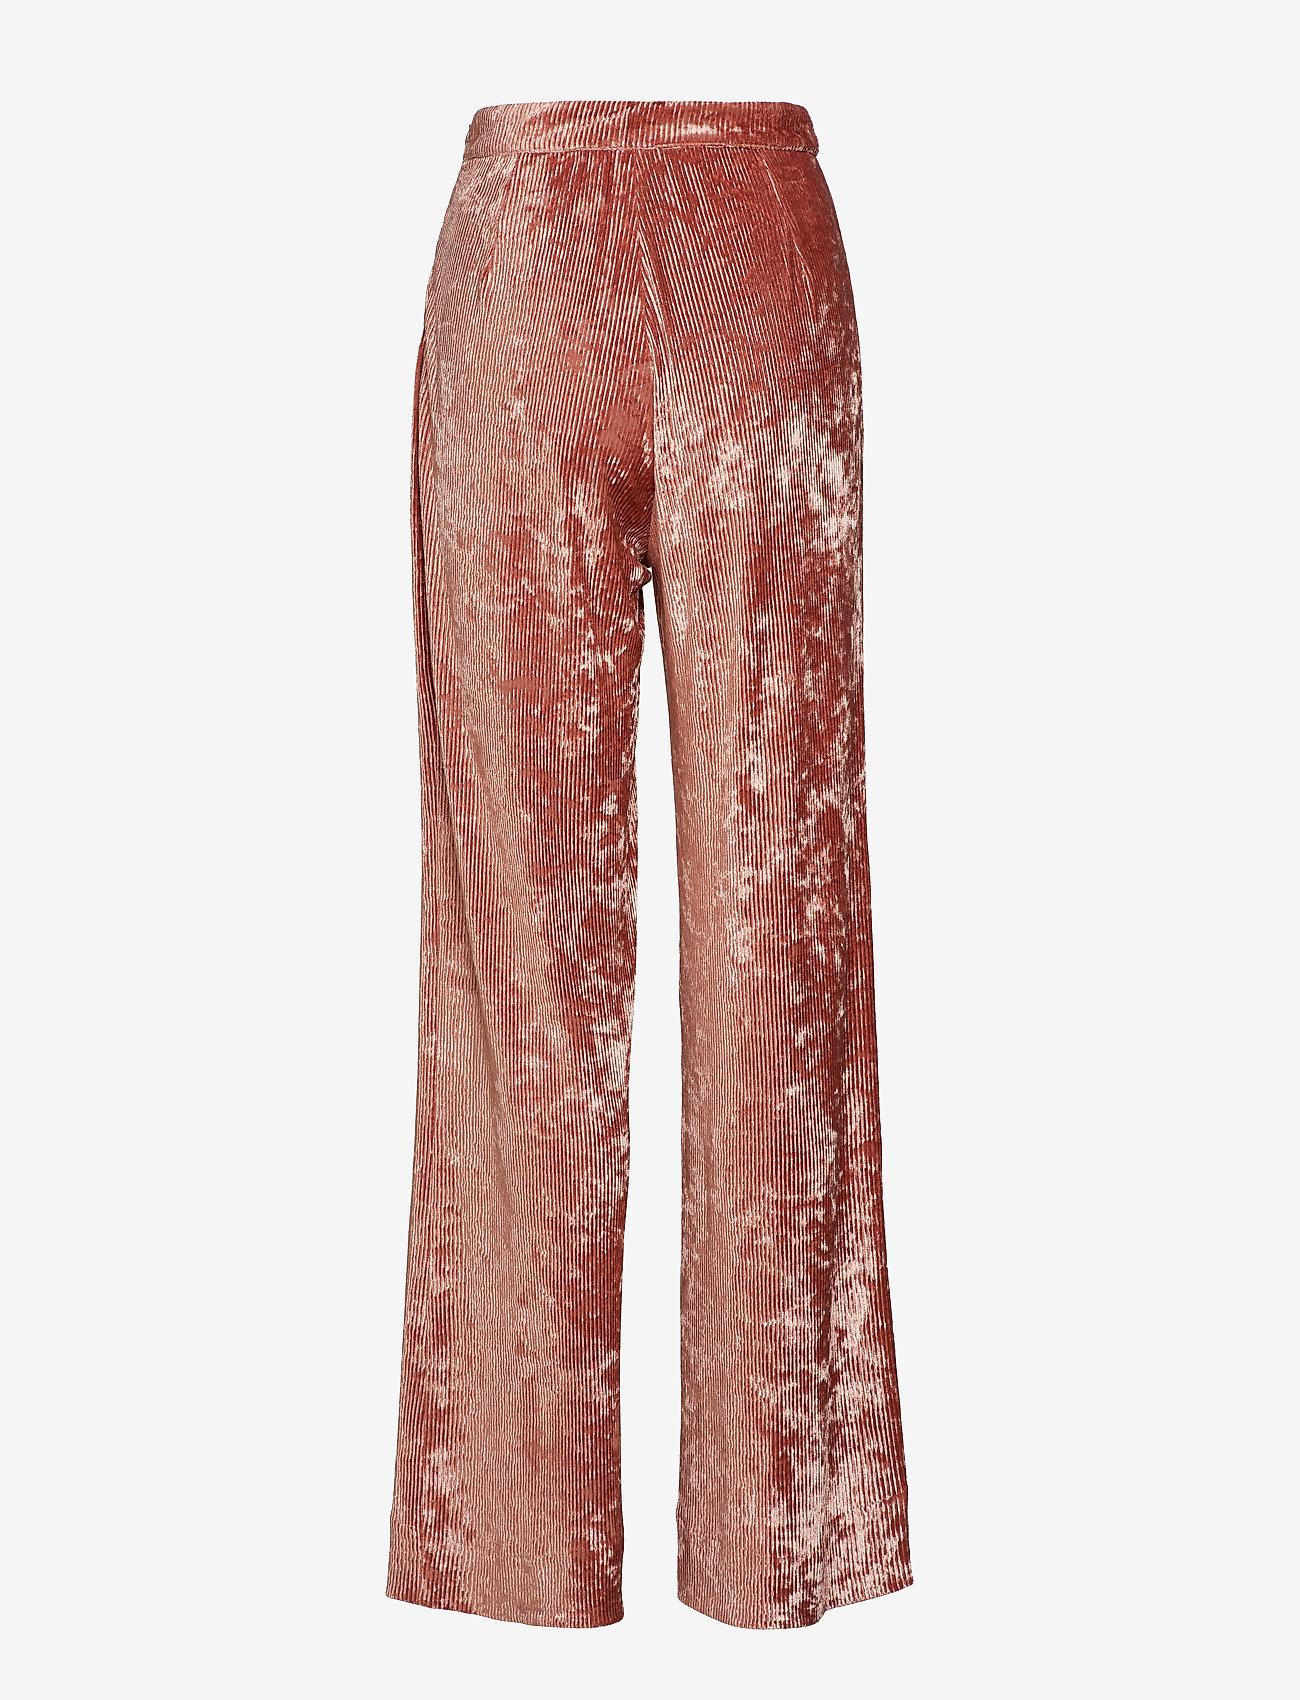 Bardot Trousers  - Aéryne